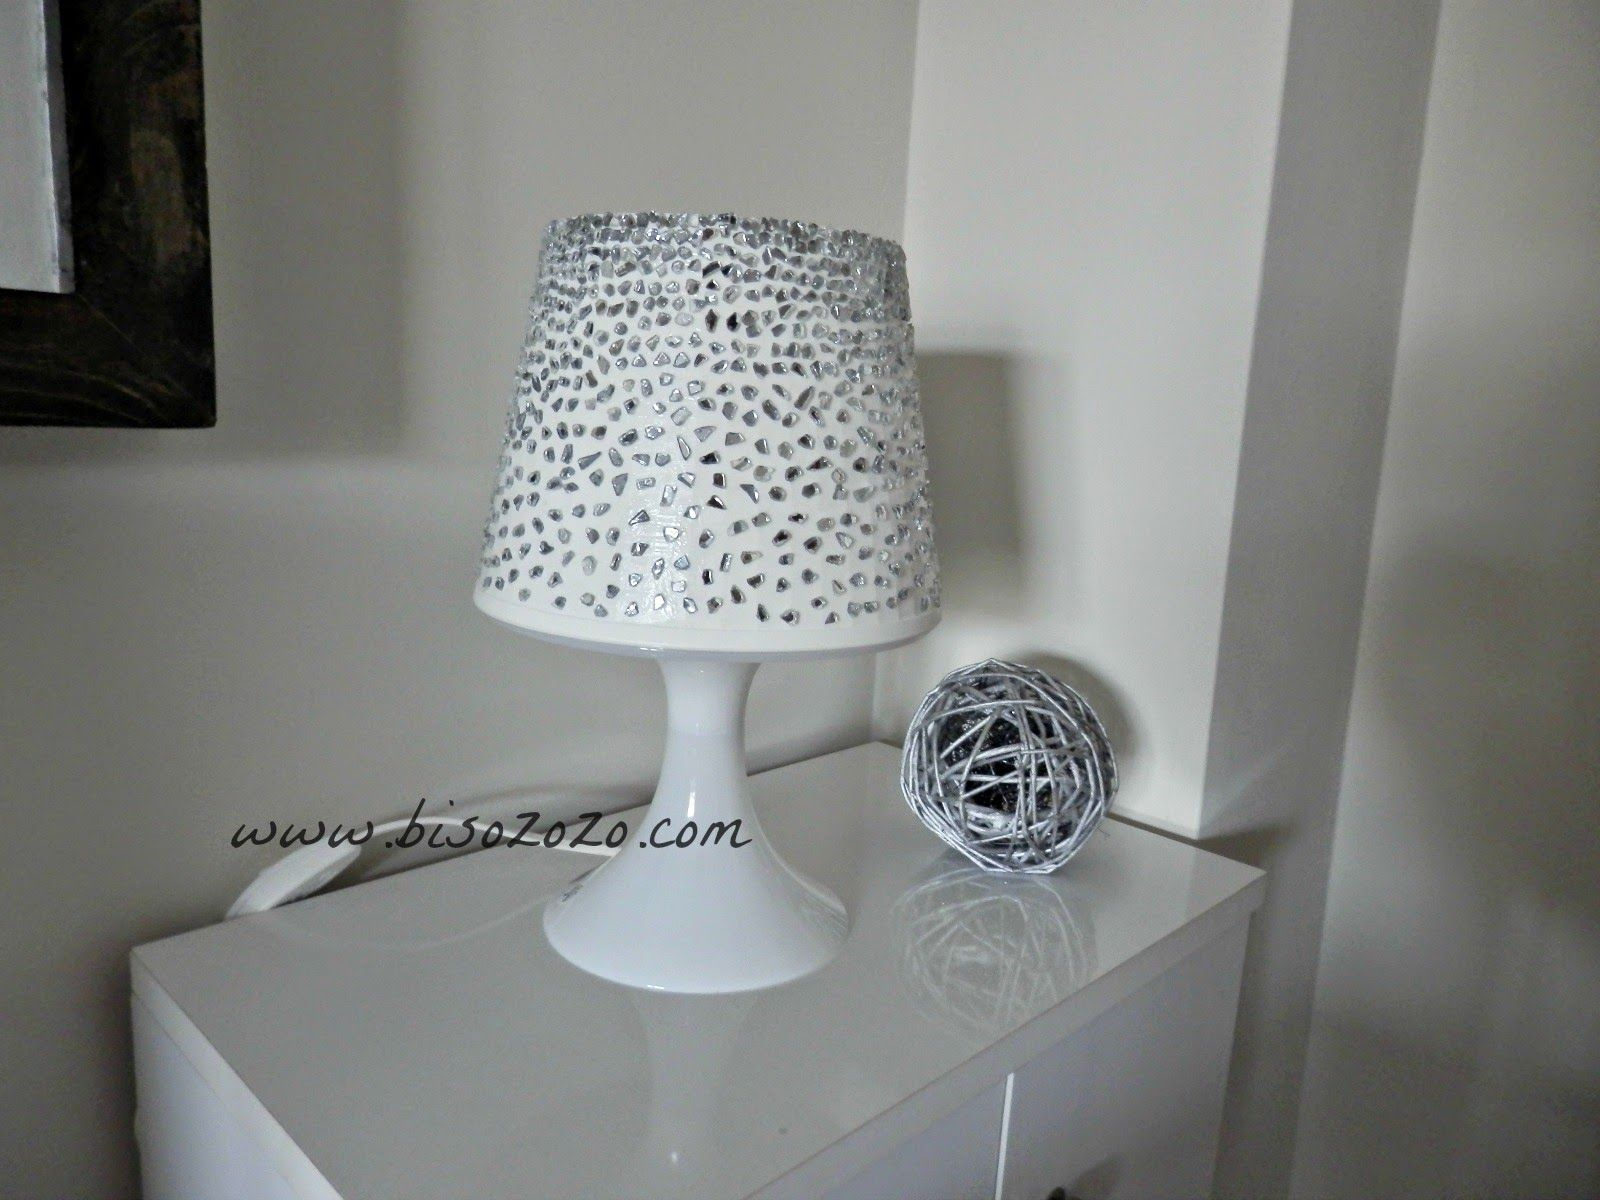 HackDéco Lamp Lampan Ikea Lampan Deco Ikea 8wOPn0k